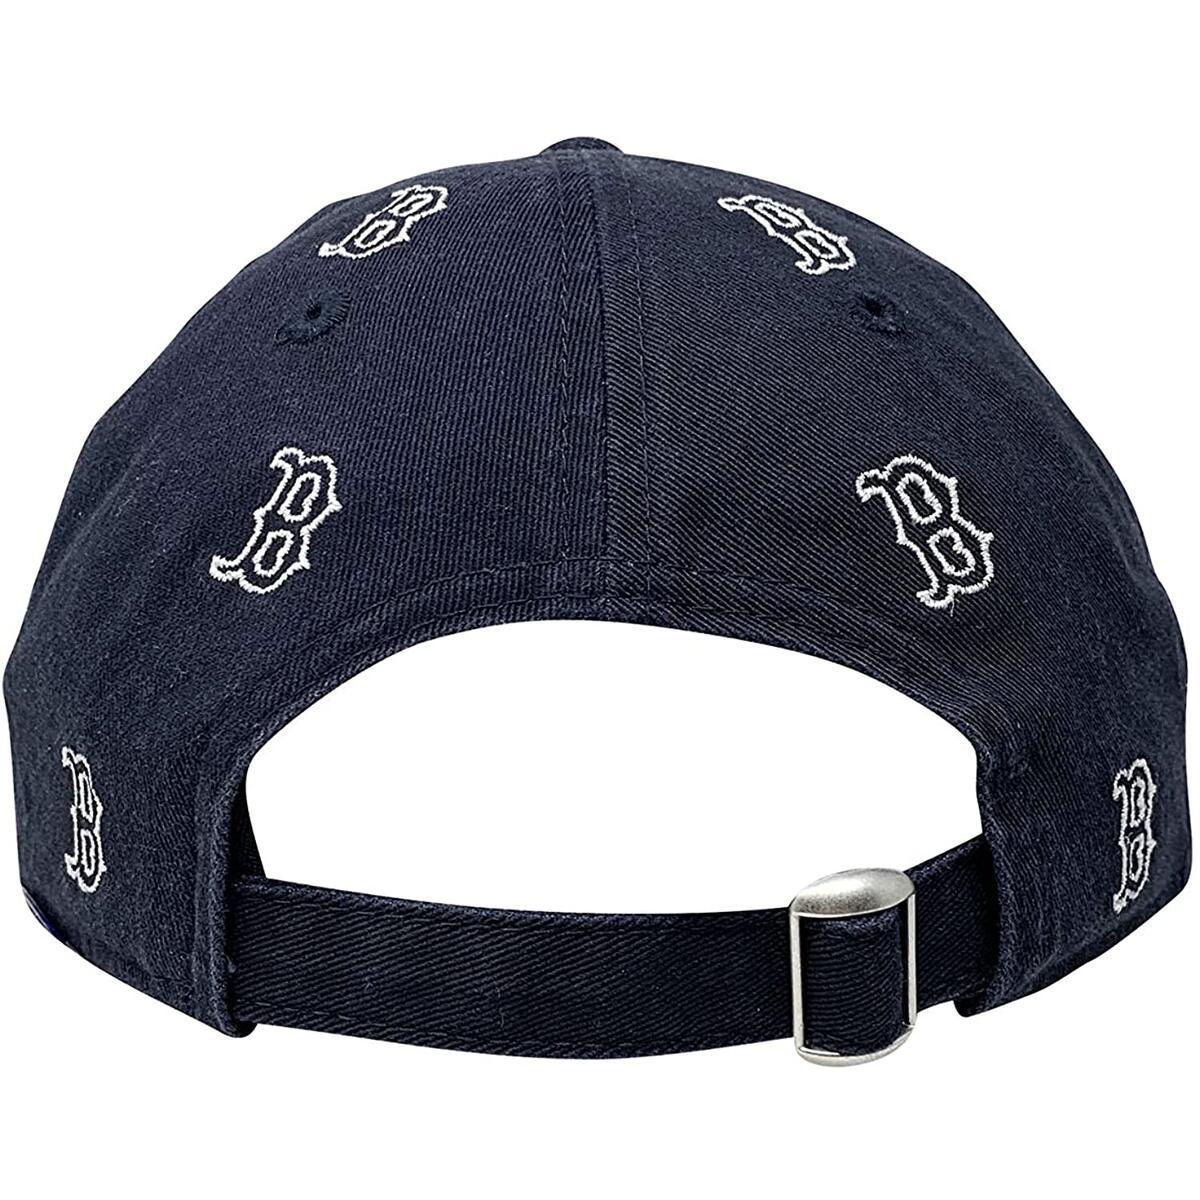 New Era Boston Red Sox Womens Adjustable Strapback Hat MLB 9Twenty Curve Bill Caps (One Size, Navy Logo Scatter)